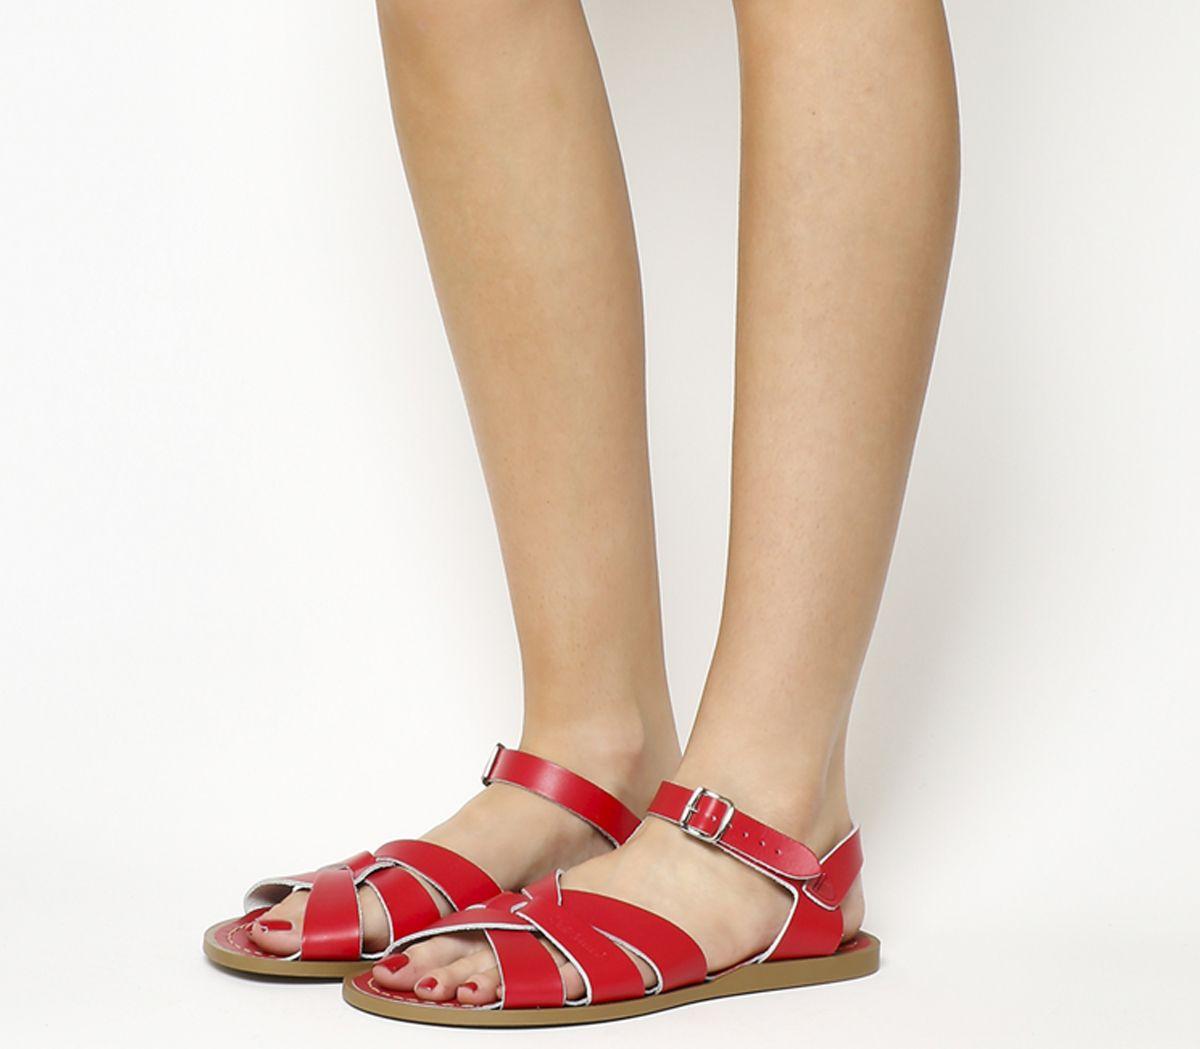 bde13dec93096 Salt Water Original Sandals Red Leather - Sandals